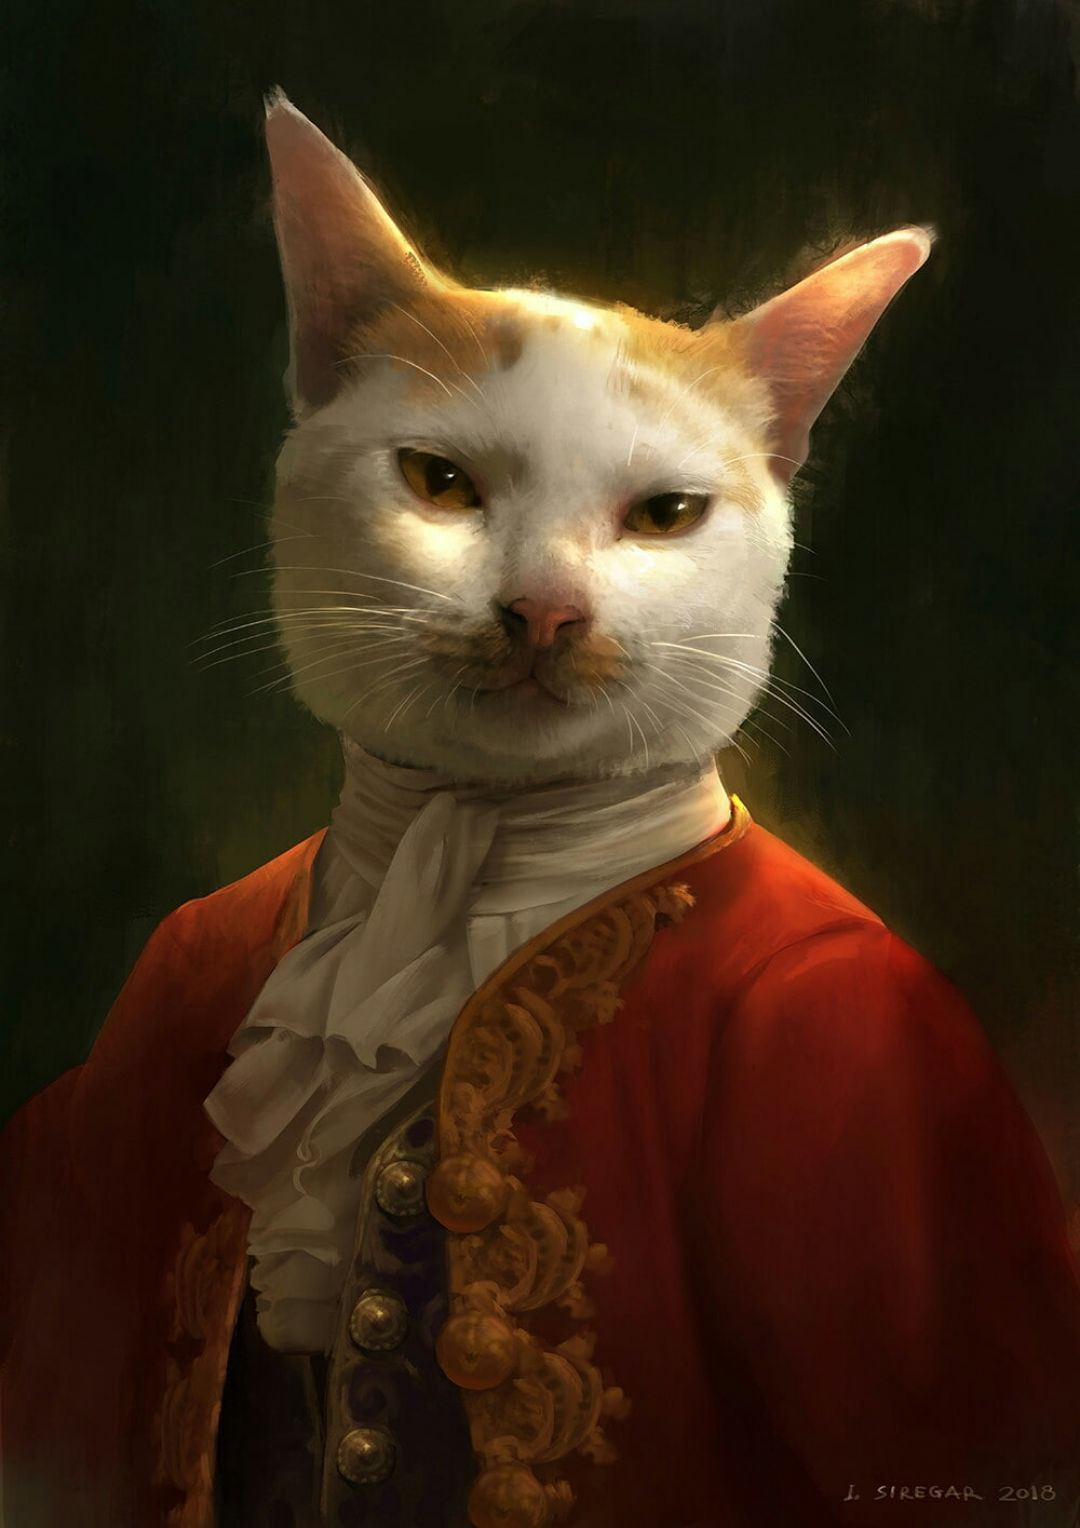 Best Android Iphone Desktop Wallpapers Download 1080p 4k 5k 3 73212 Hdphotos Hdwallpapers Hdimages Animal Portraits Art Cat Art Cat Portraits